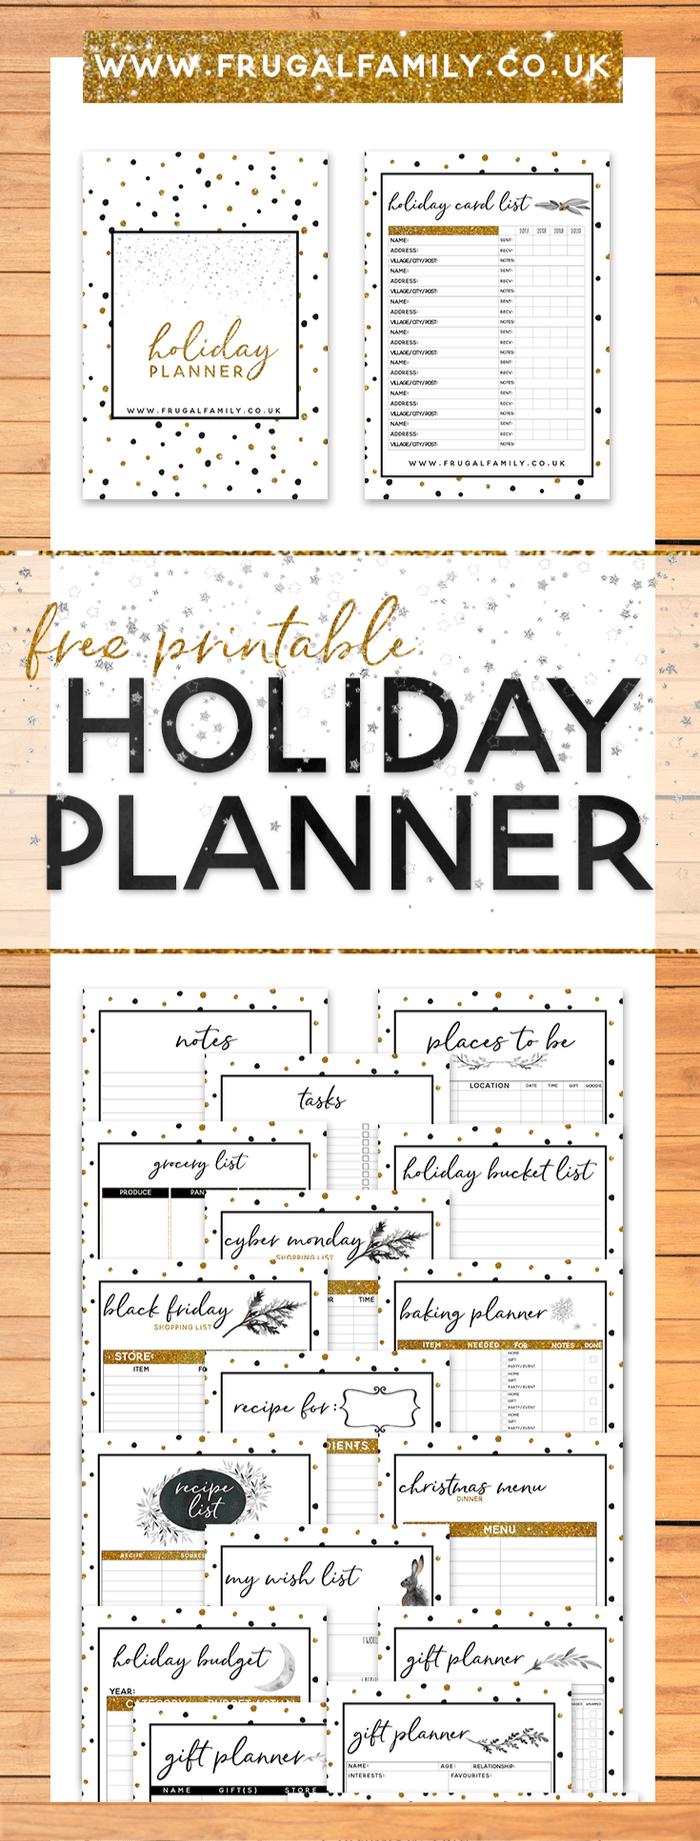 Amazing Christmas Planner - Free Printable!